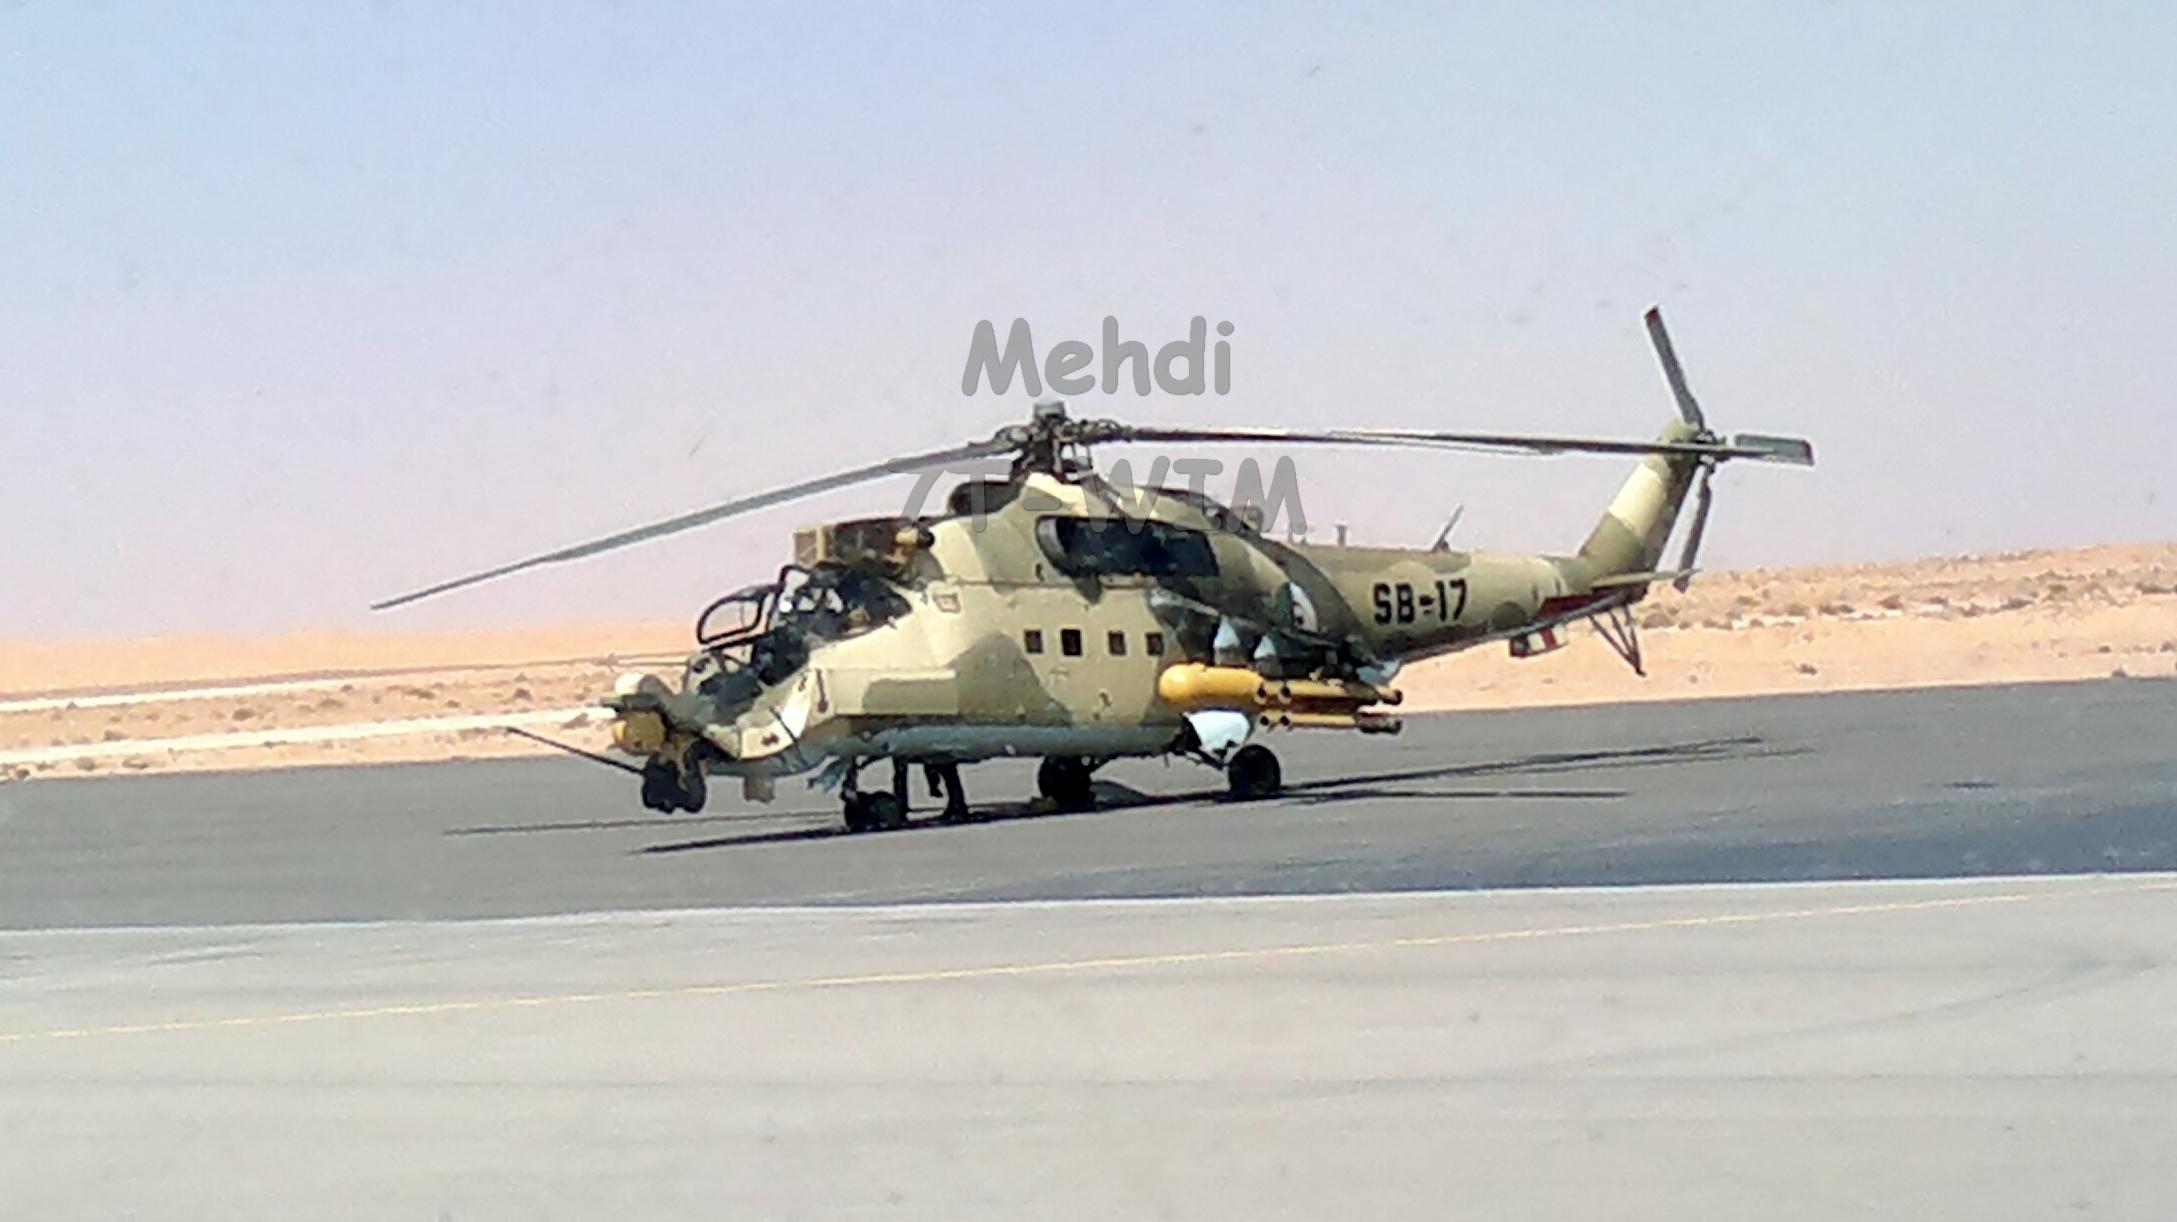 صور مروحيات Mi-24MKIII SuperHind الجزائرية 351906DossierBluetoothExchange00001